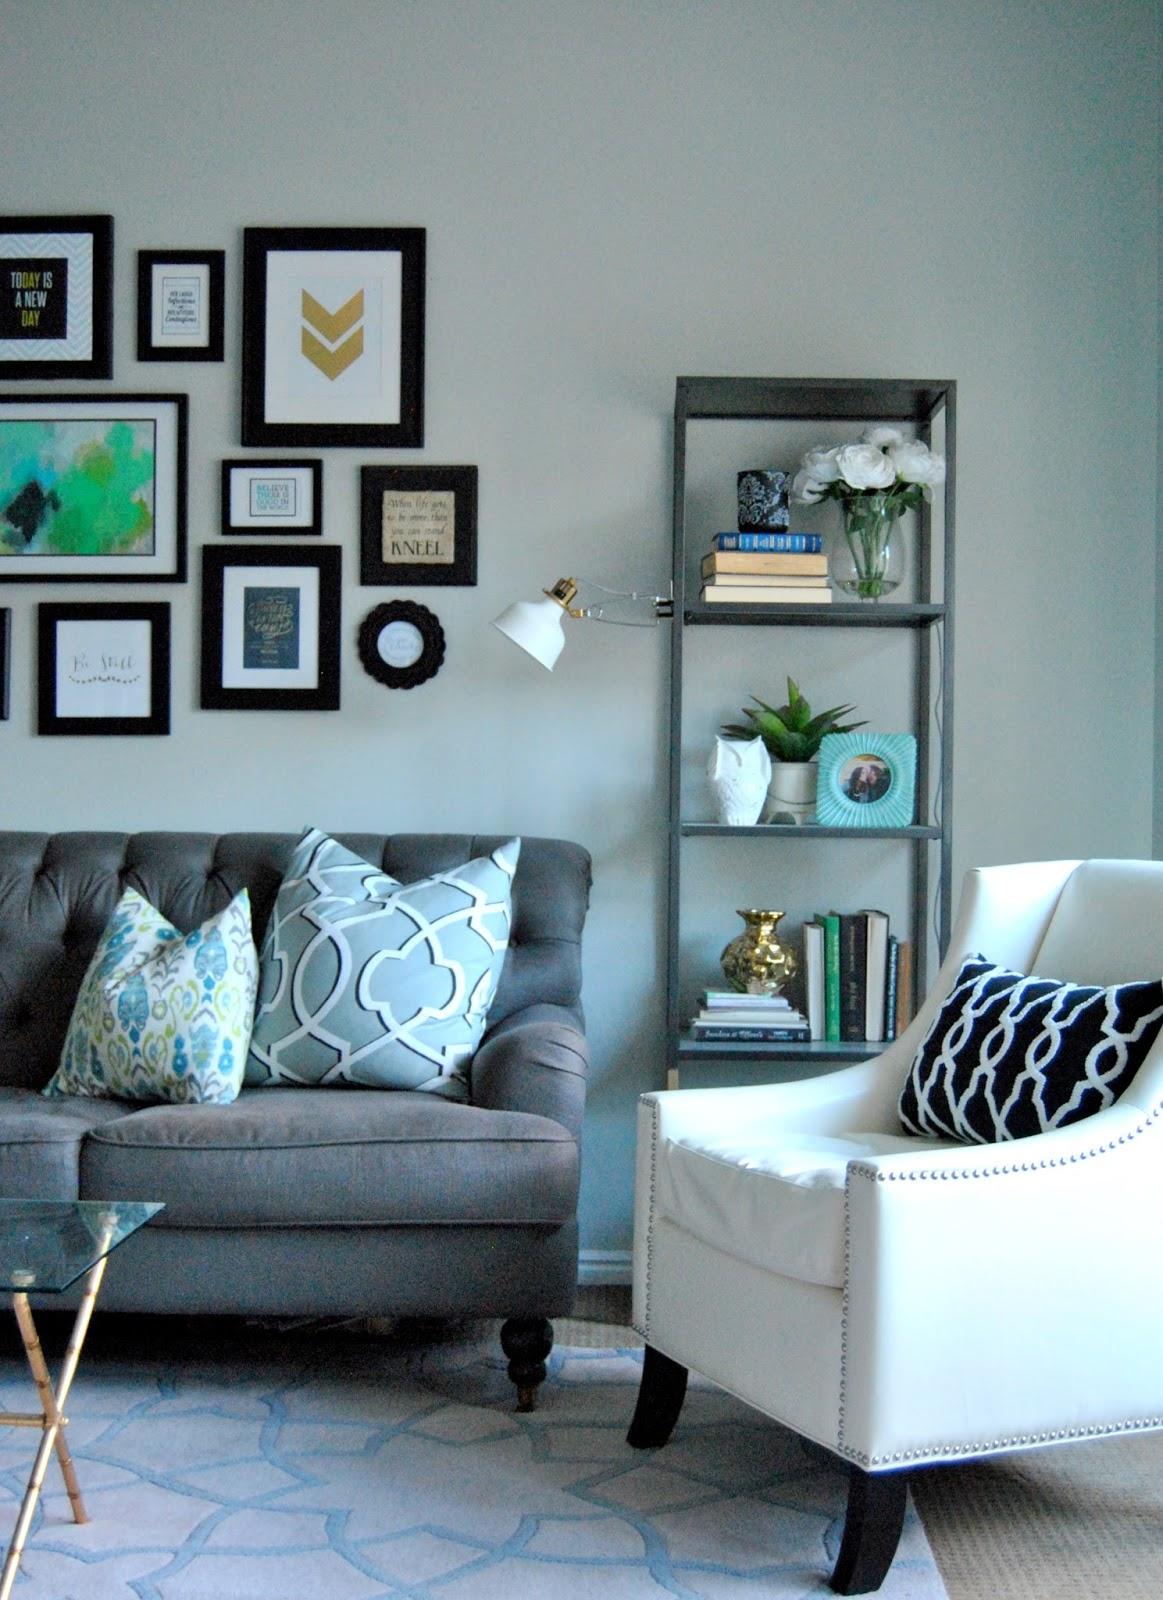 Studio 7 Interior Design Black  White Faves List